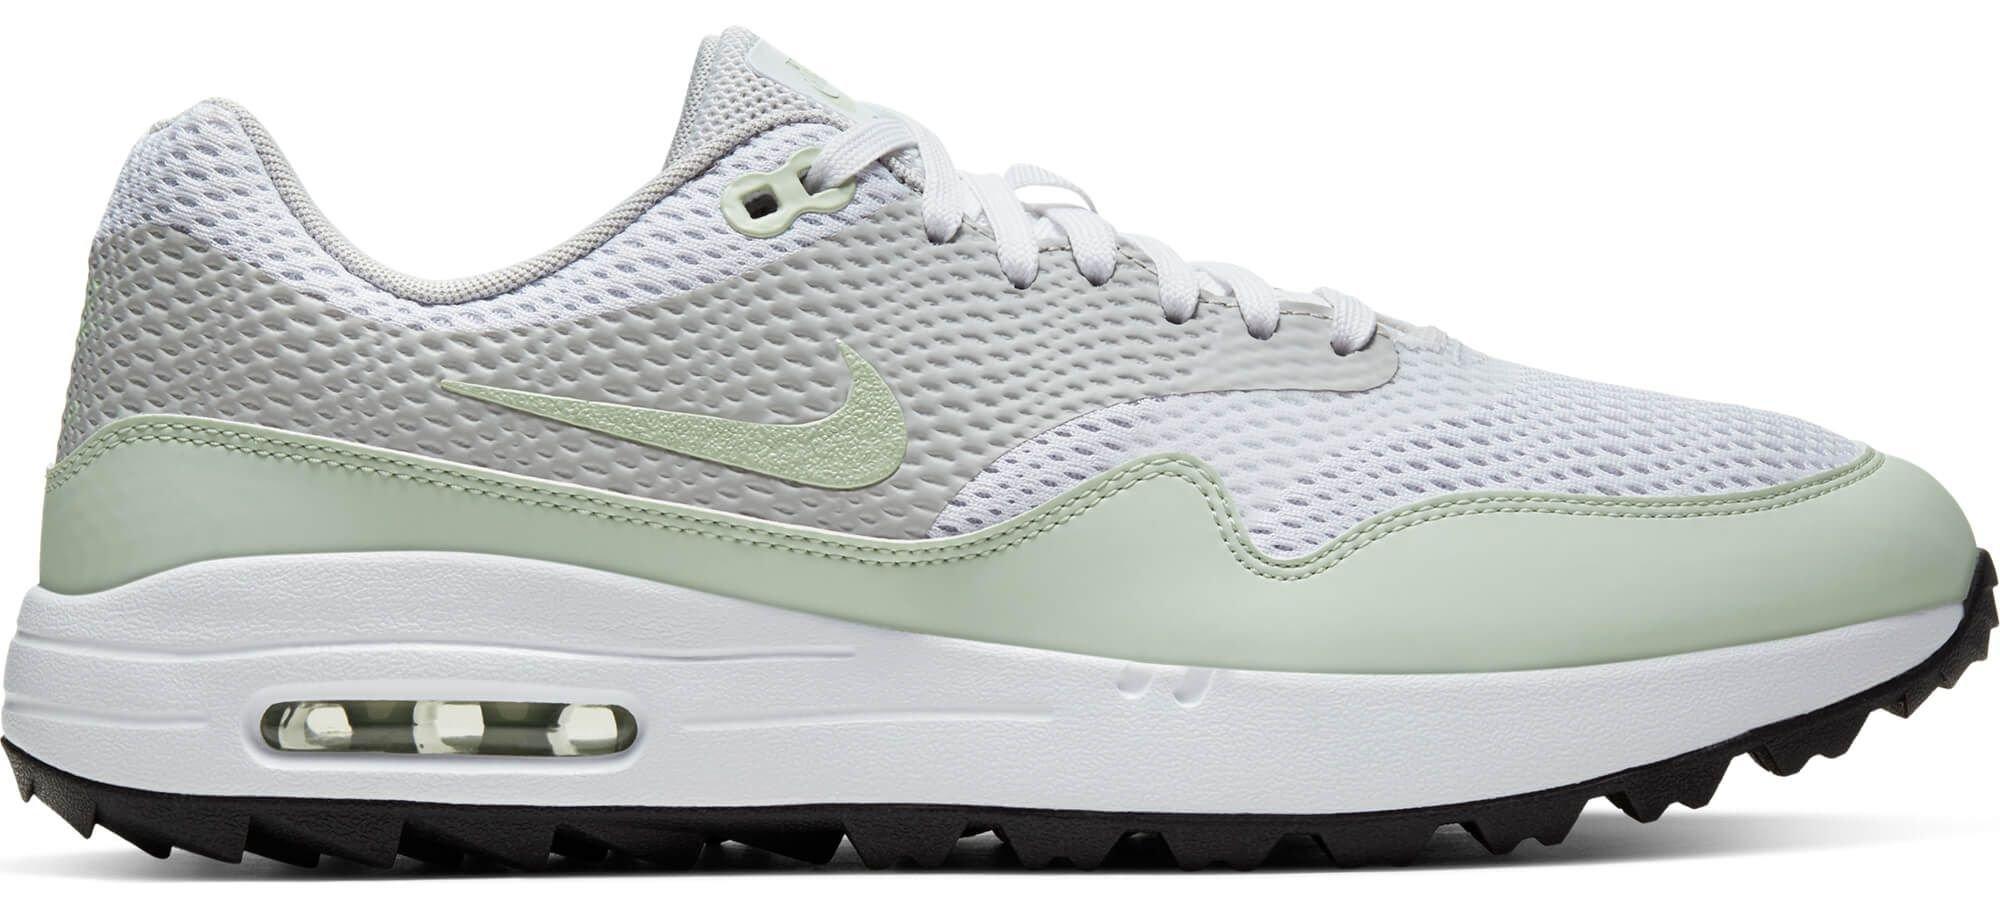 nike air max 1 golf grey